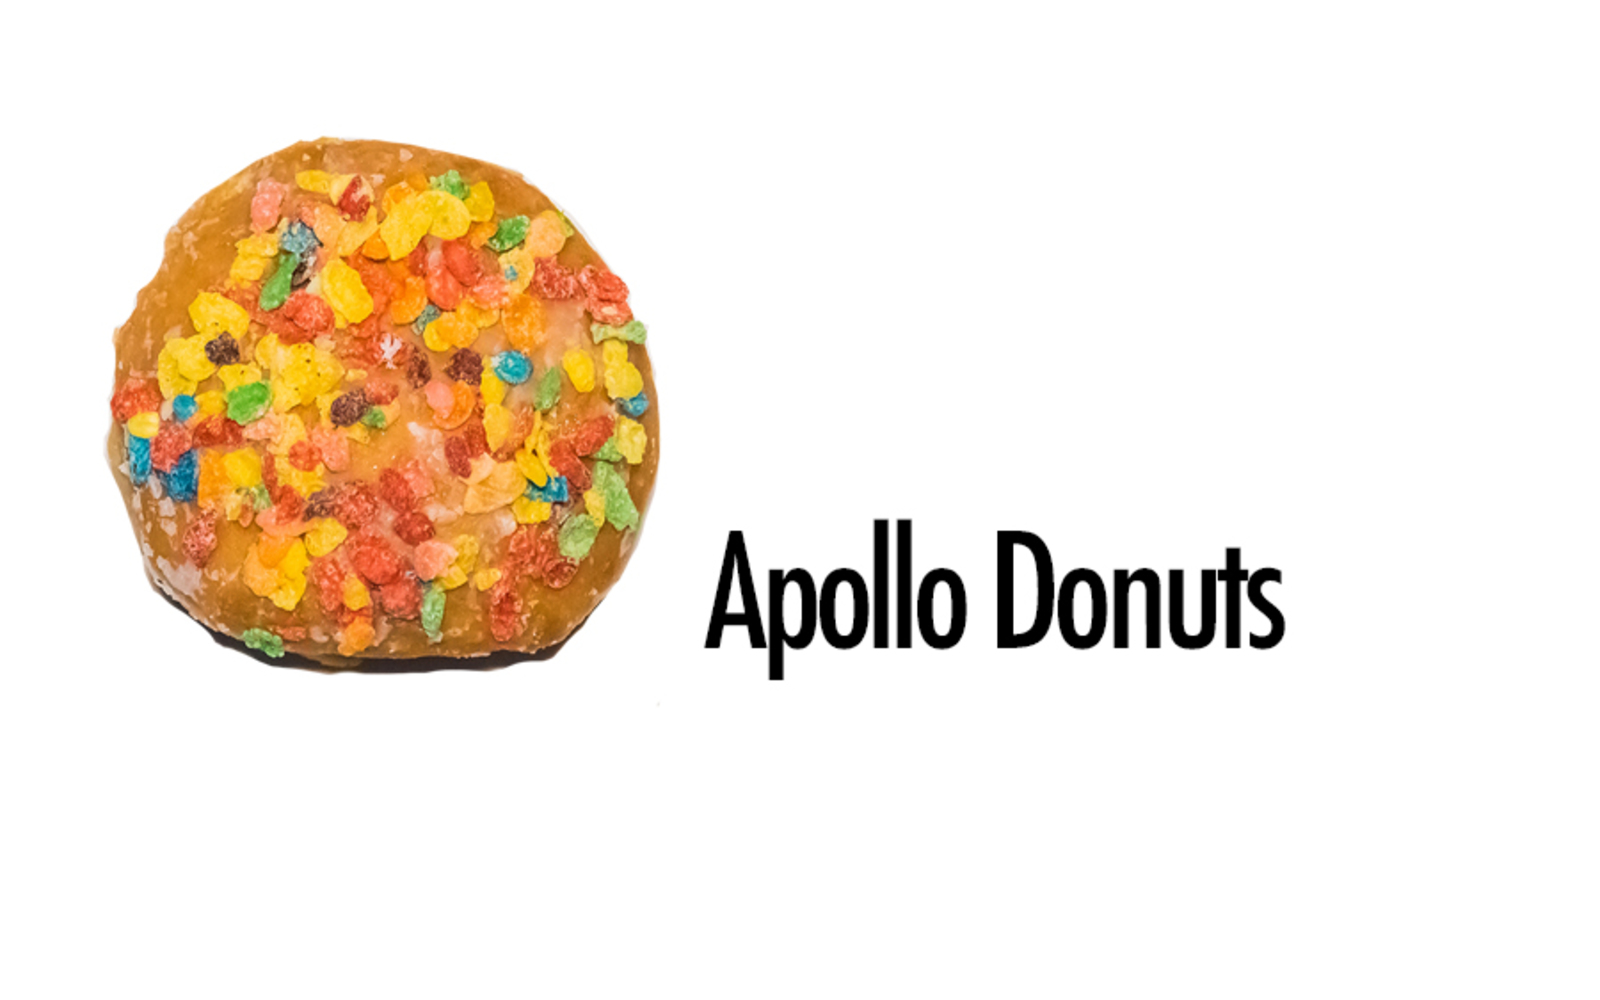 Normal2x apollo donut image